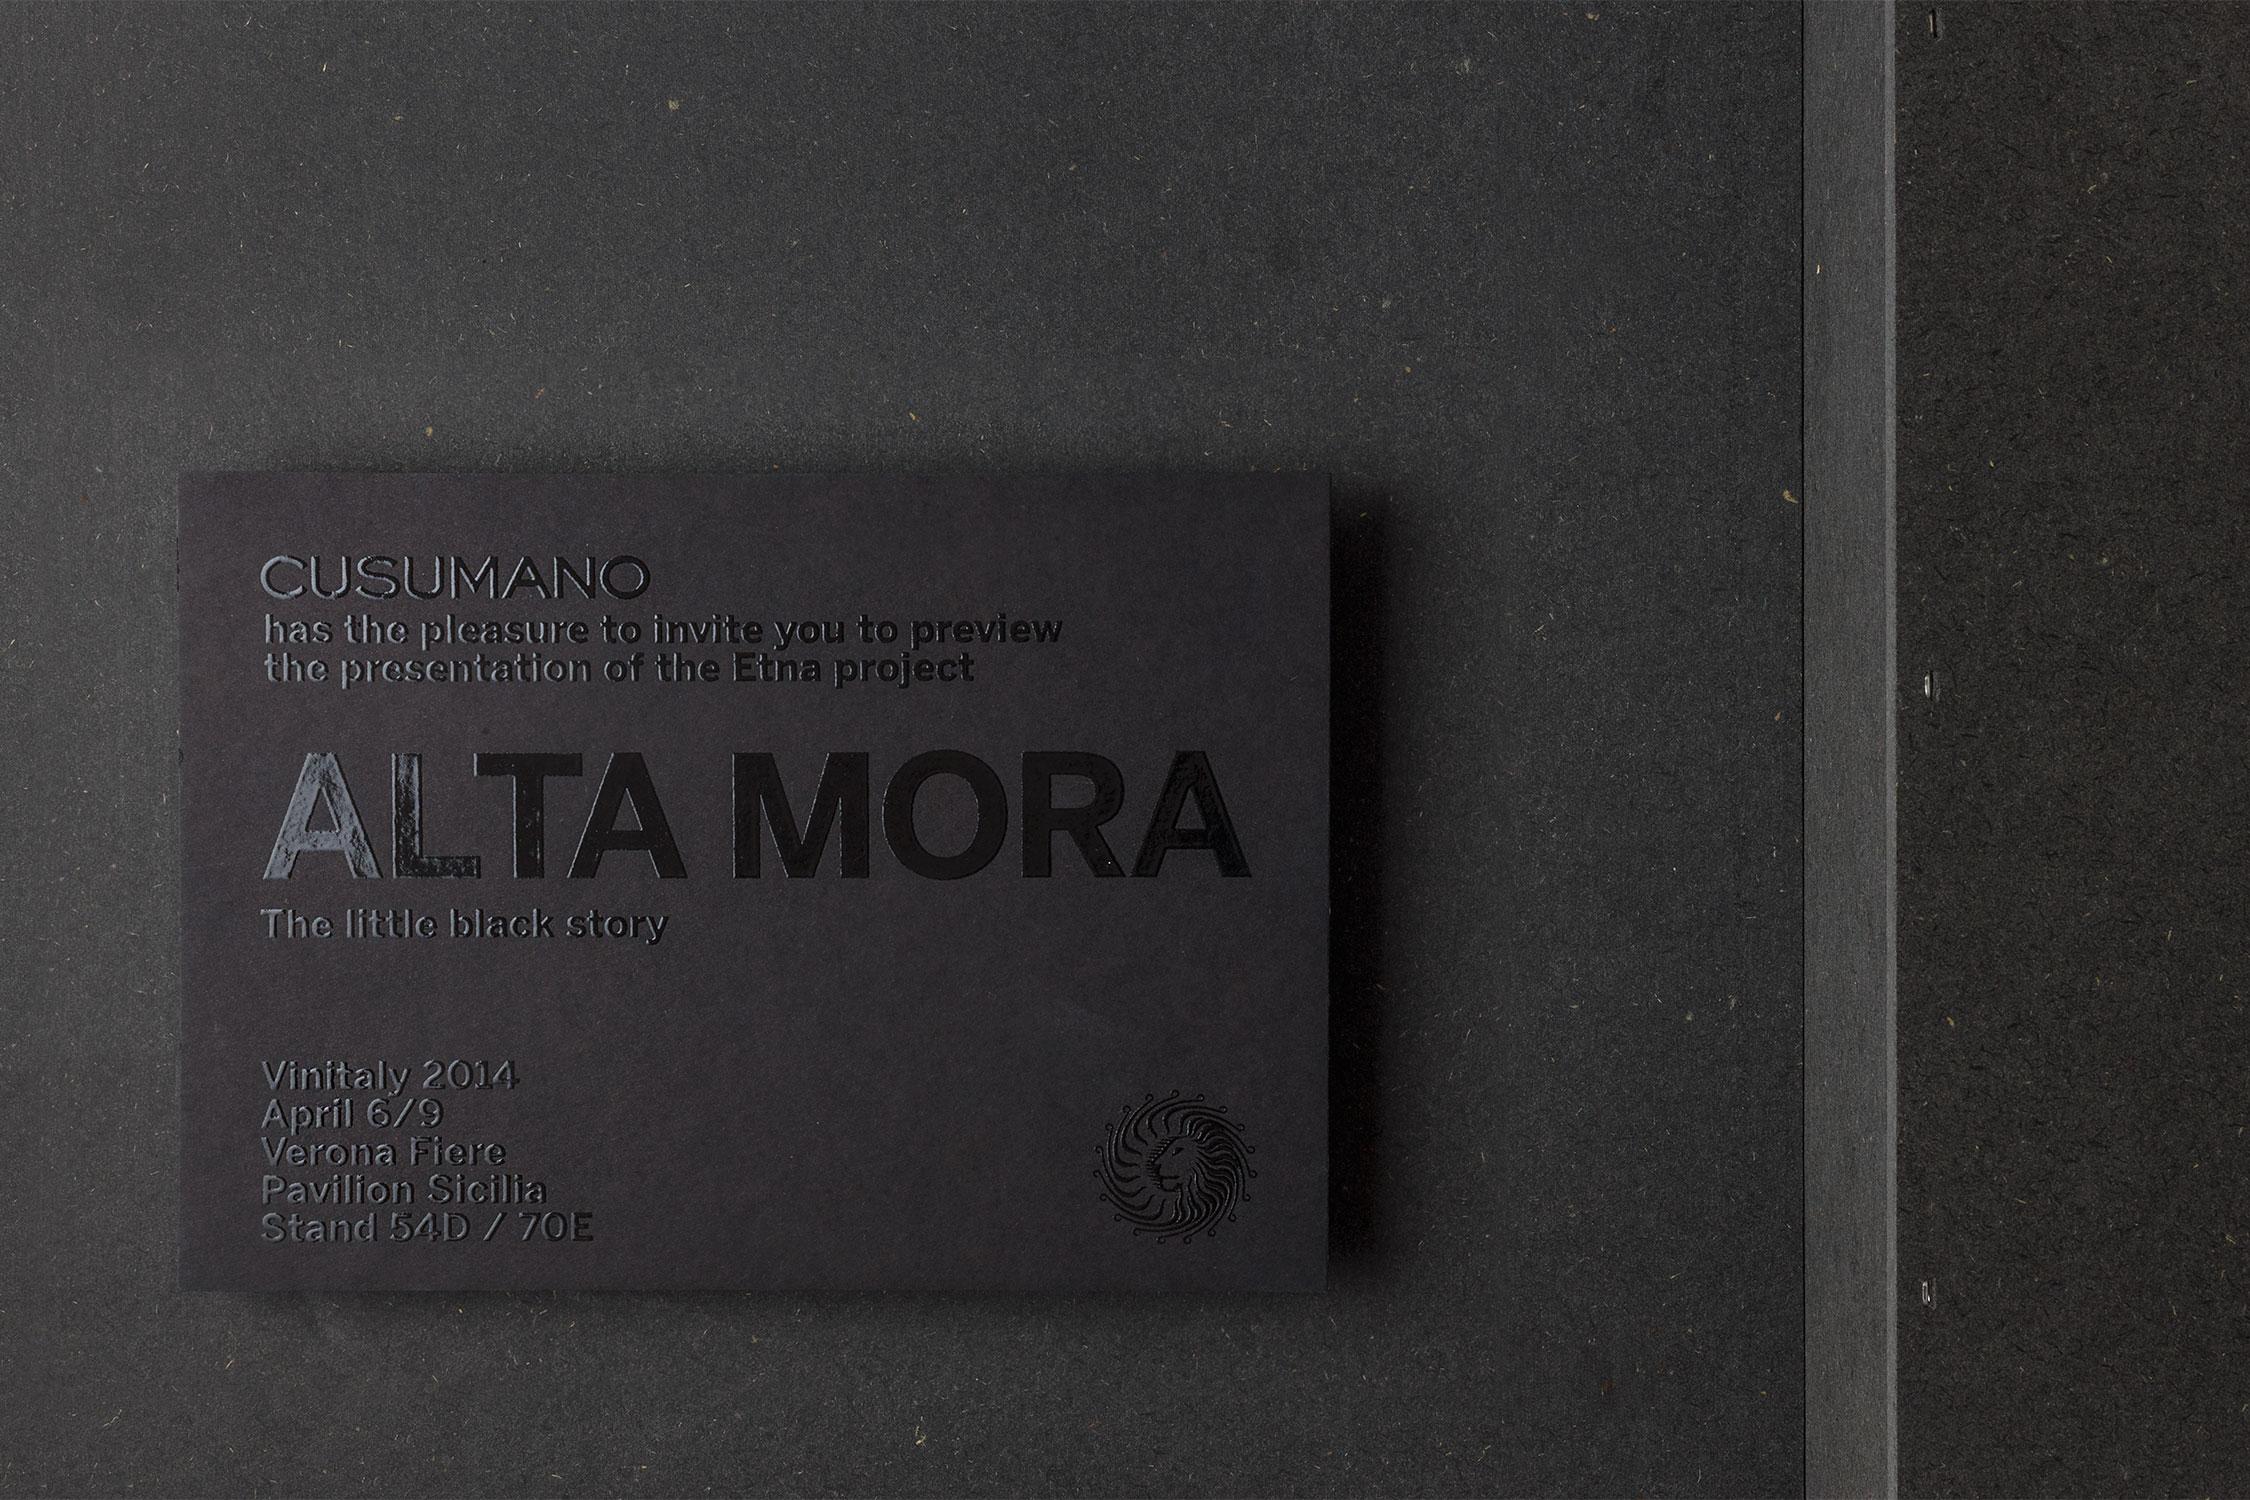 altamora_atelier790_6873